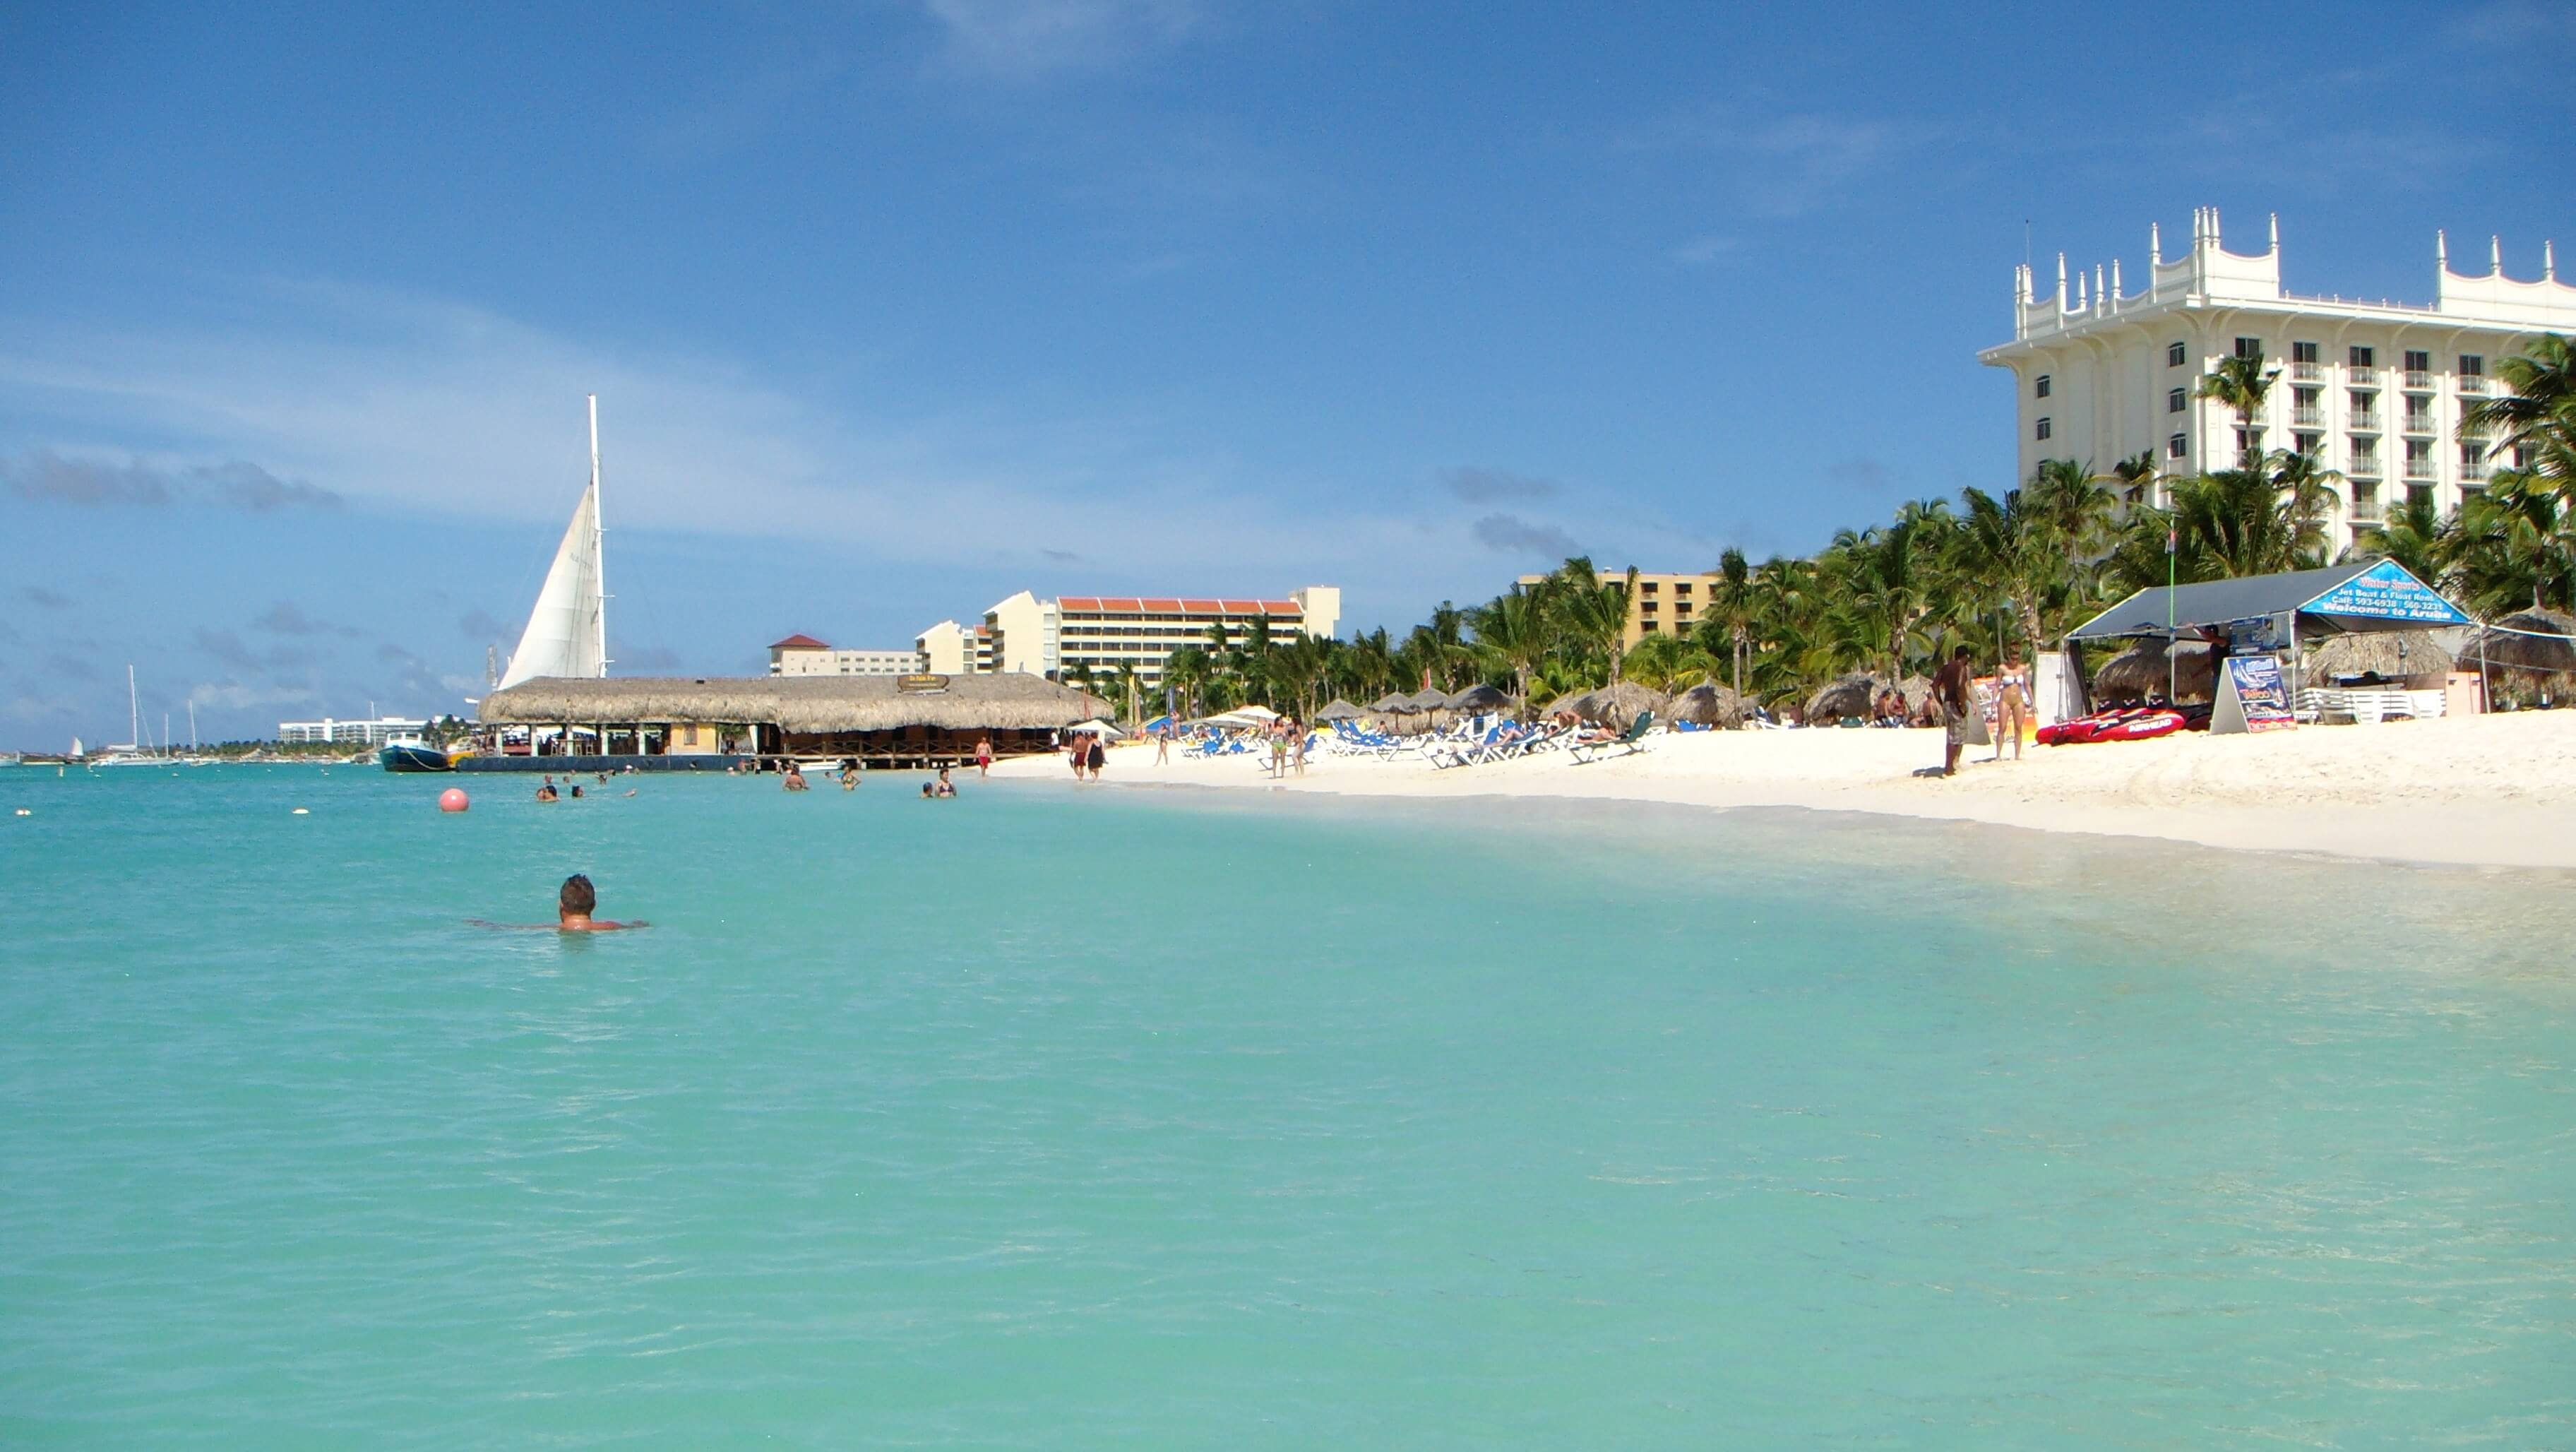 Hoteles Aruba - Manchebo Beach Resort - Spa - Eagle Beach